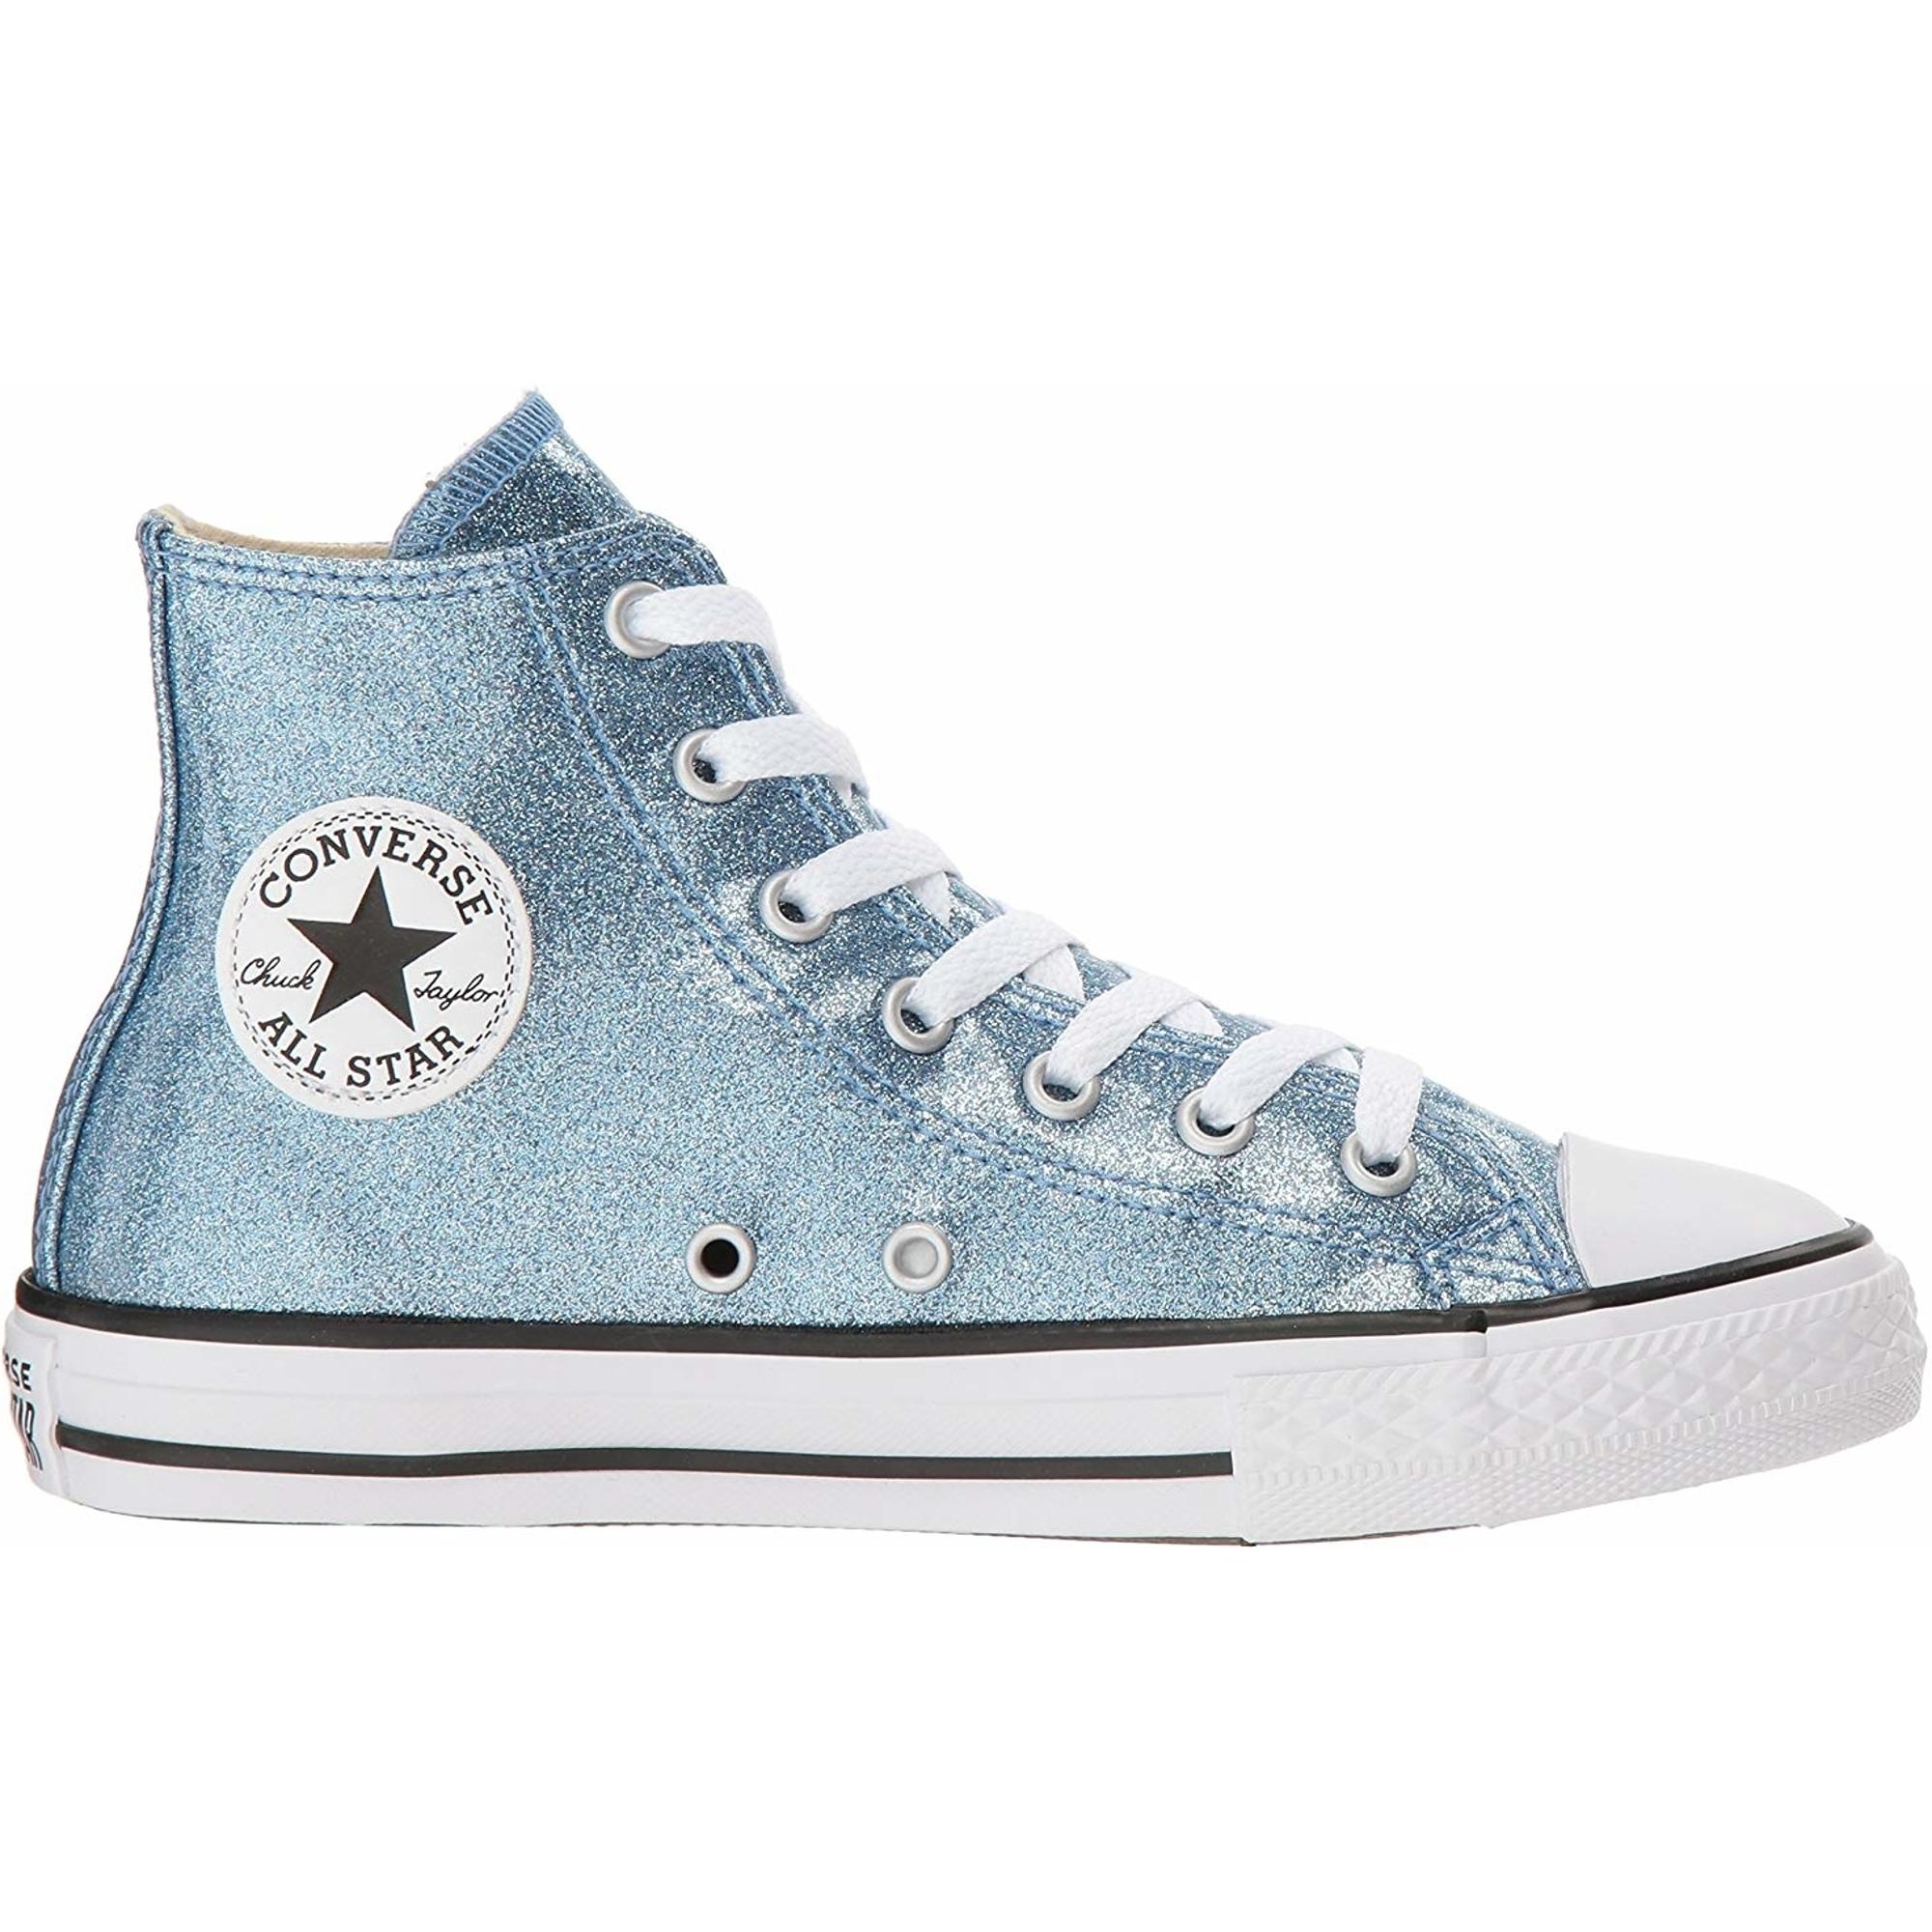 2converse all star bambina glitter